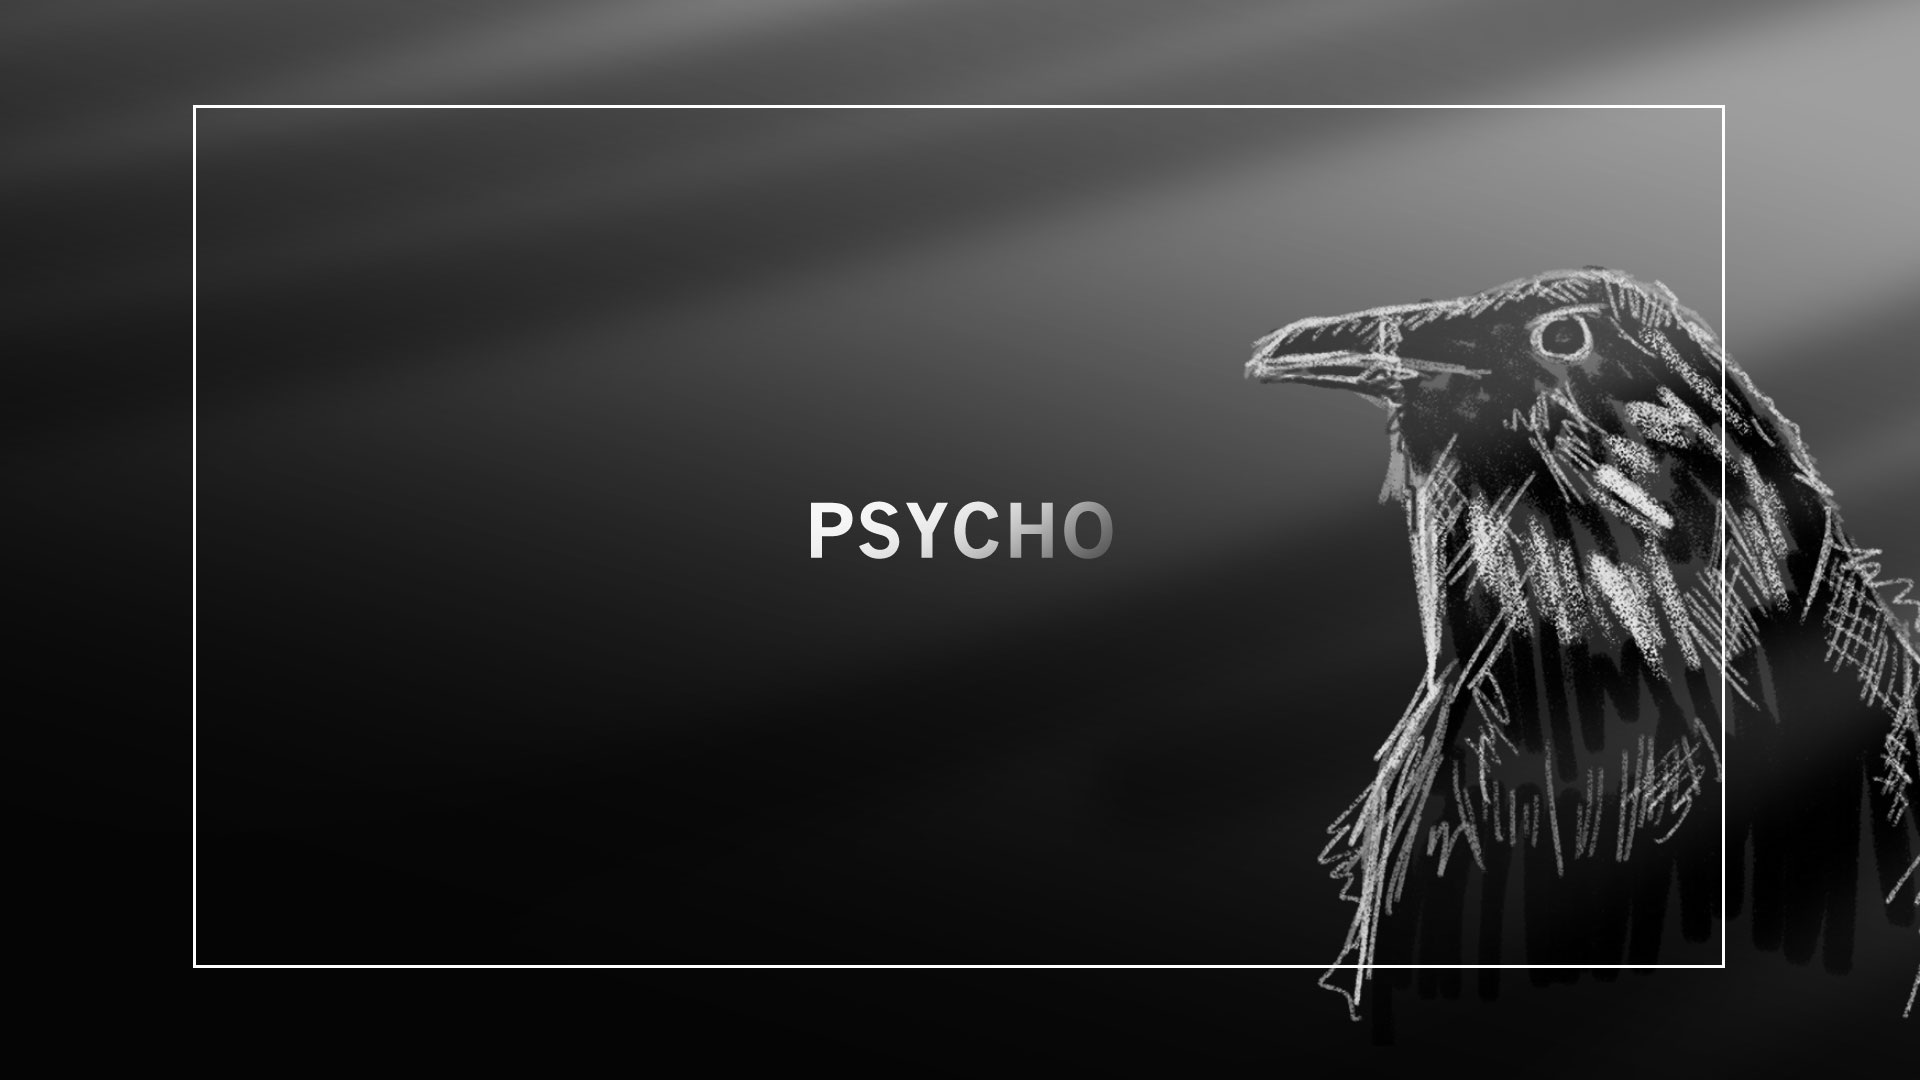 PSYCHO_Storyboard_Animatic_00188.jpg